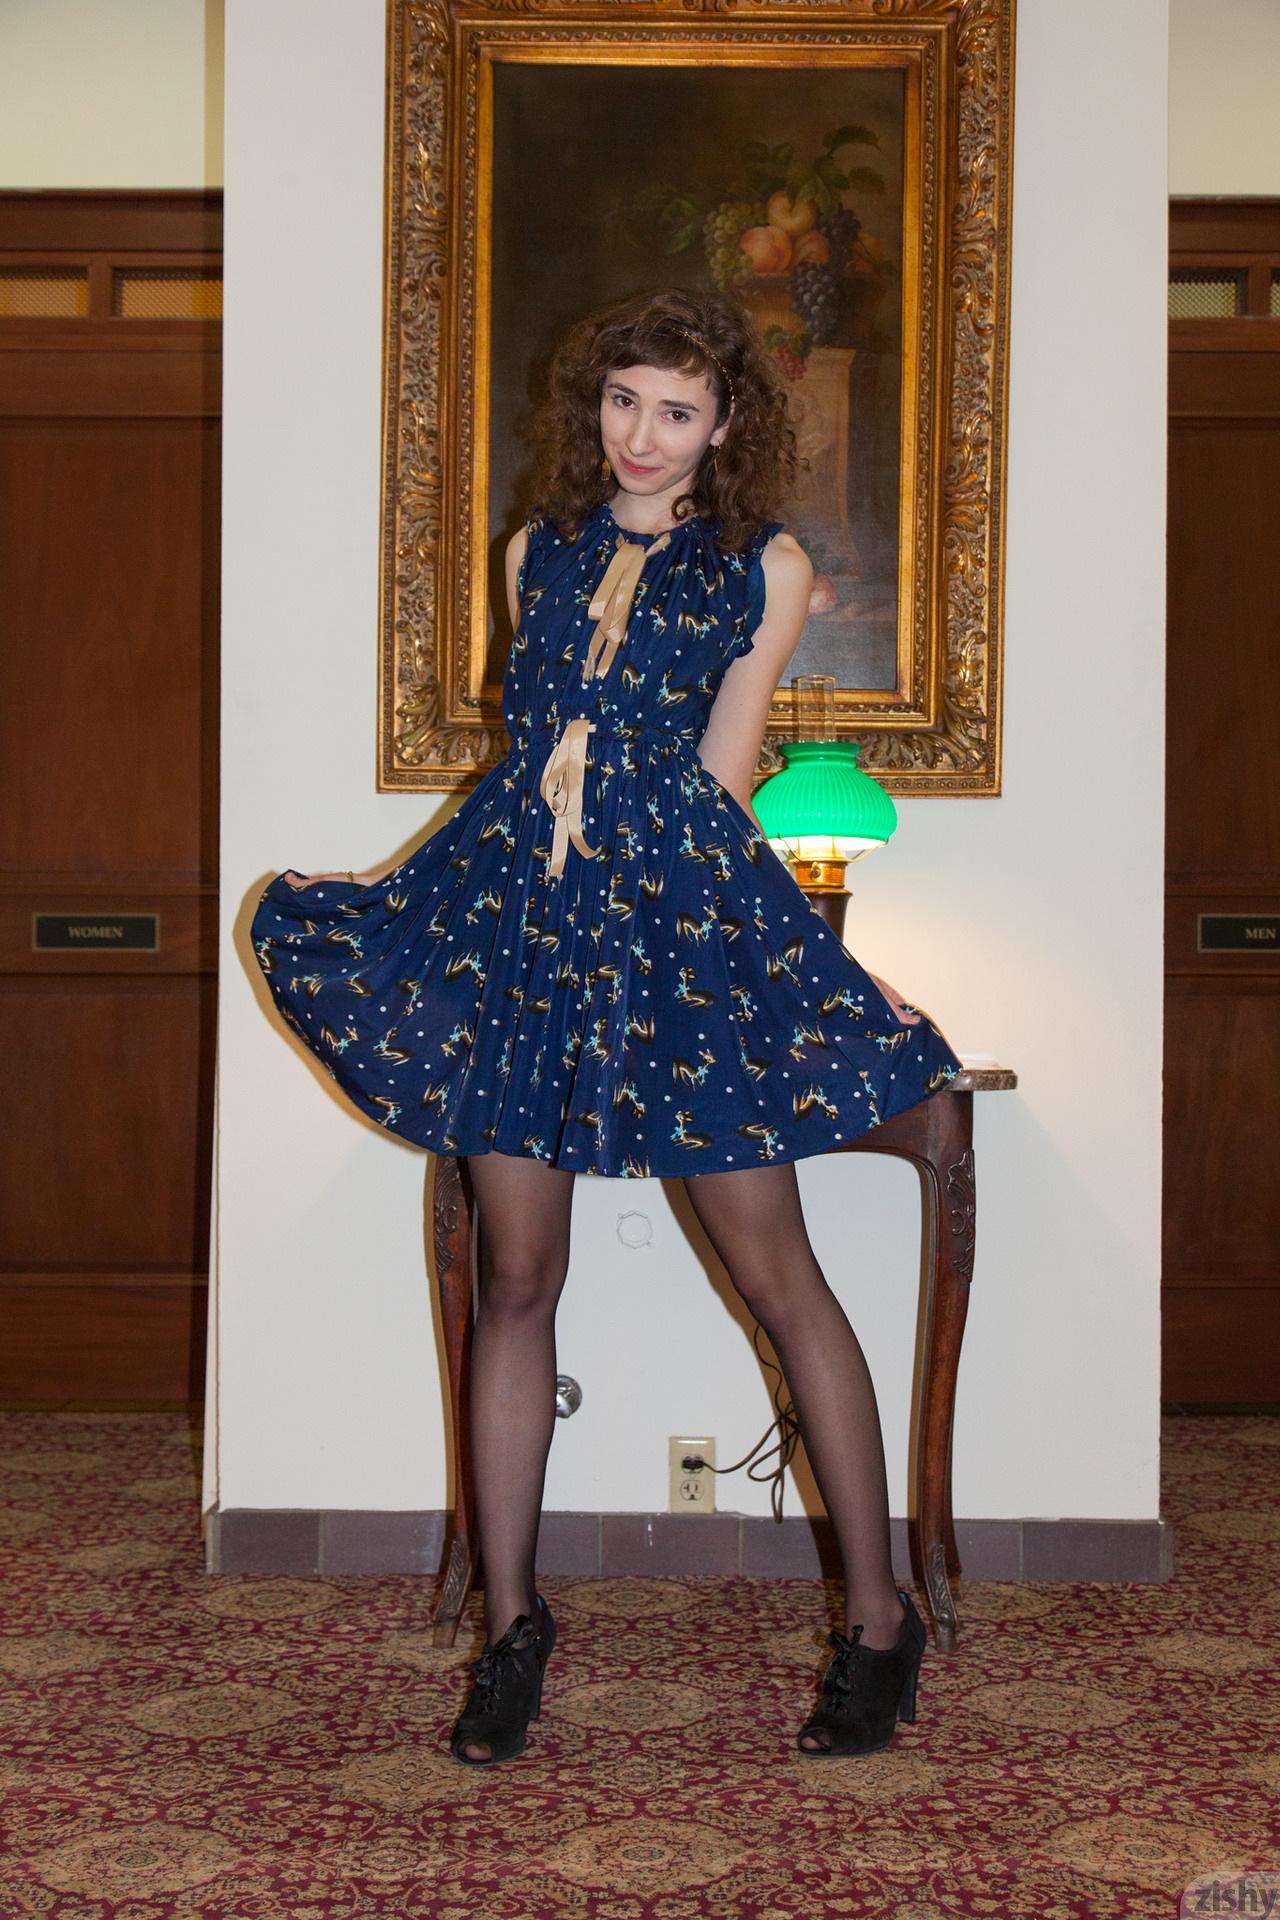 Yvette Nolot At Arizona Inn Zishy (21)